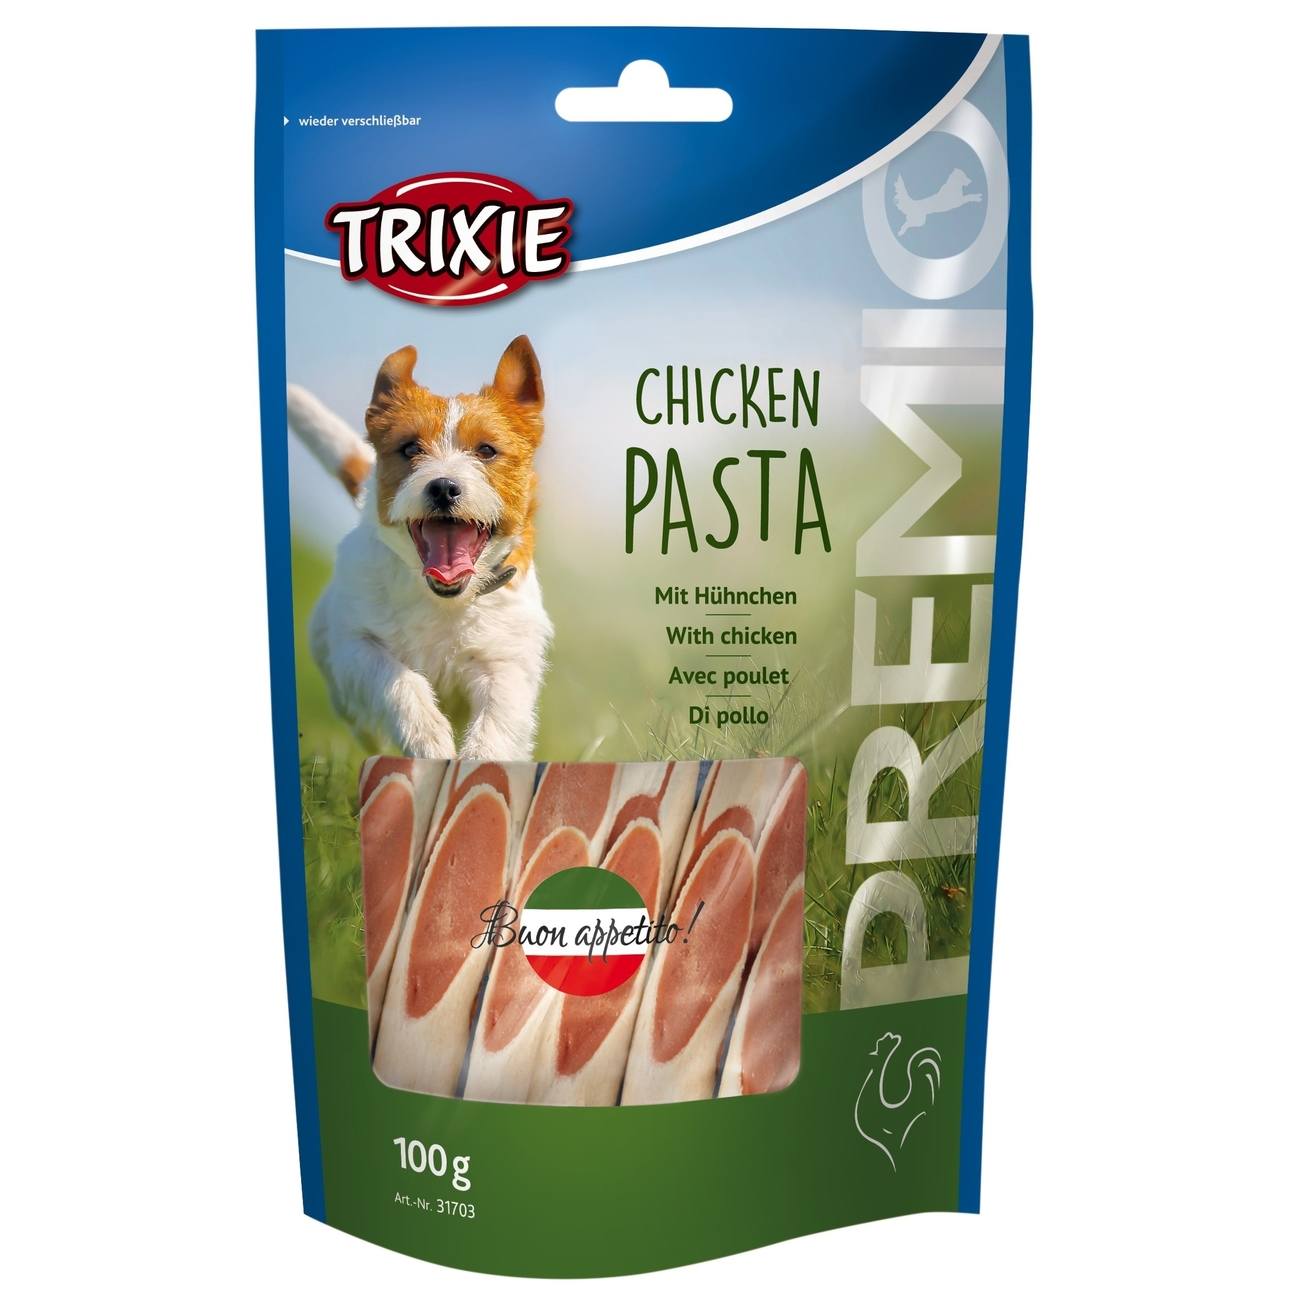 Trixie Premio Chicken Pasta Hundesnack 31703